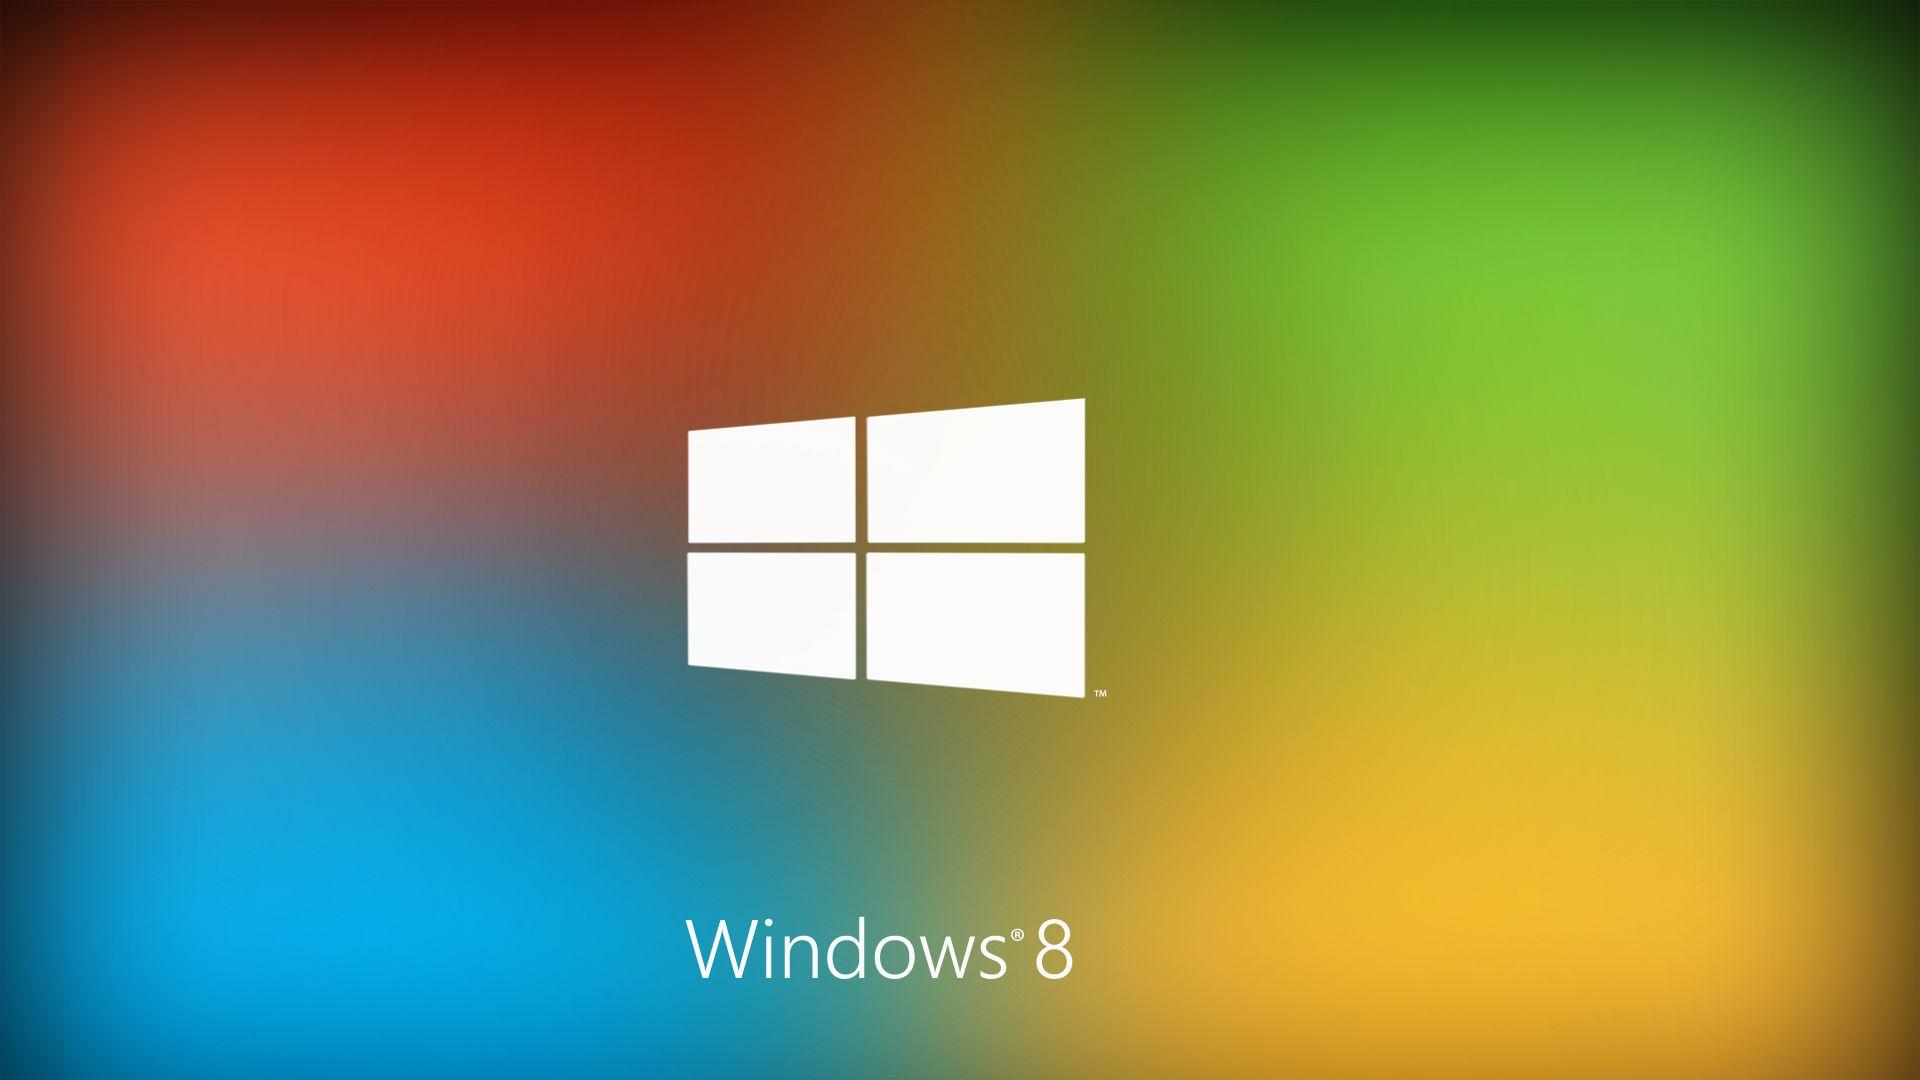 microsoft windows hd desktop wallpaper amazing wallpaperz 1920×1200